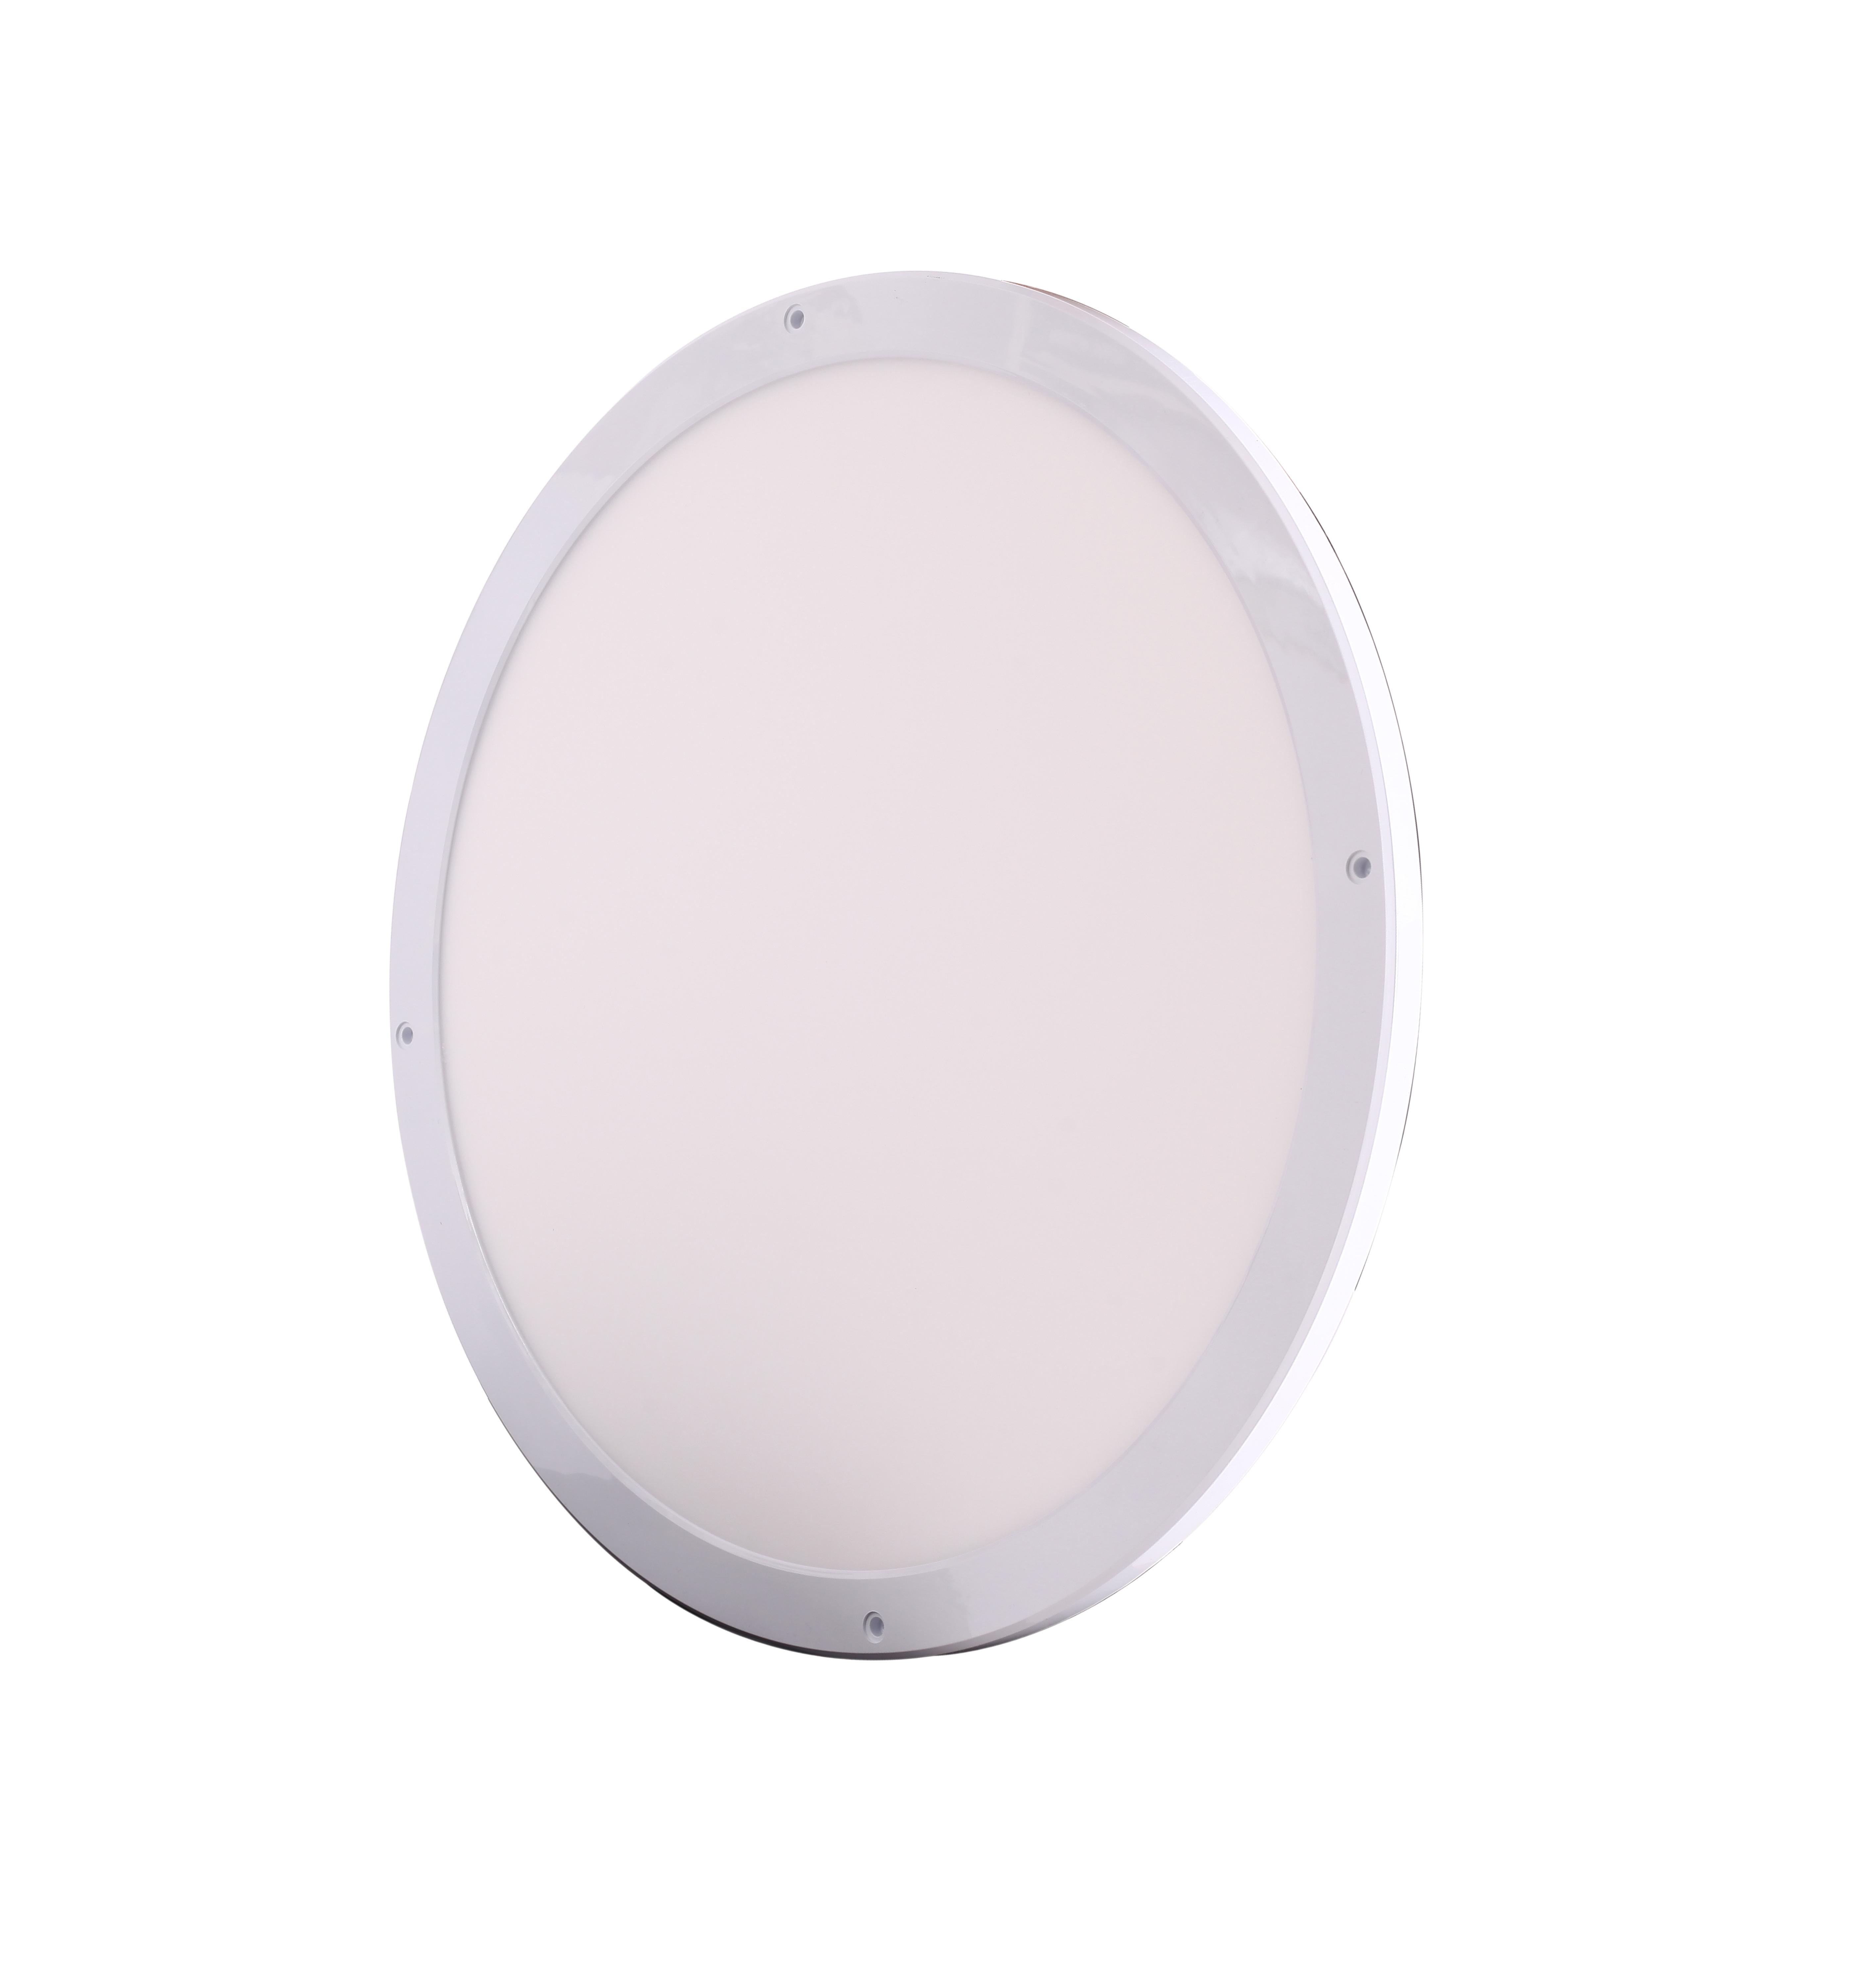 超薄led圆形面板灯 直径160mm